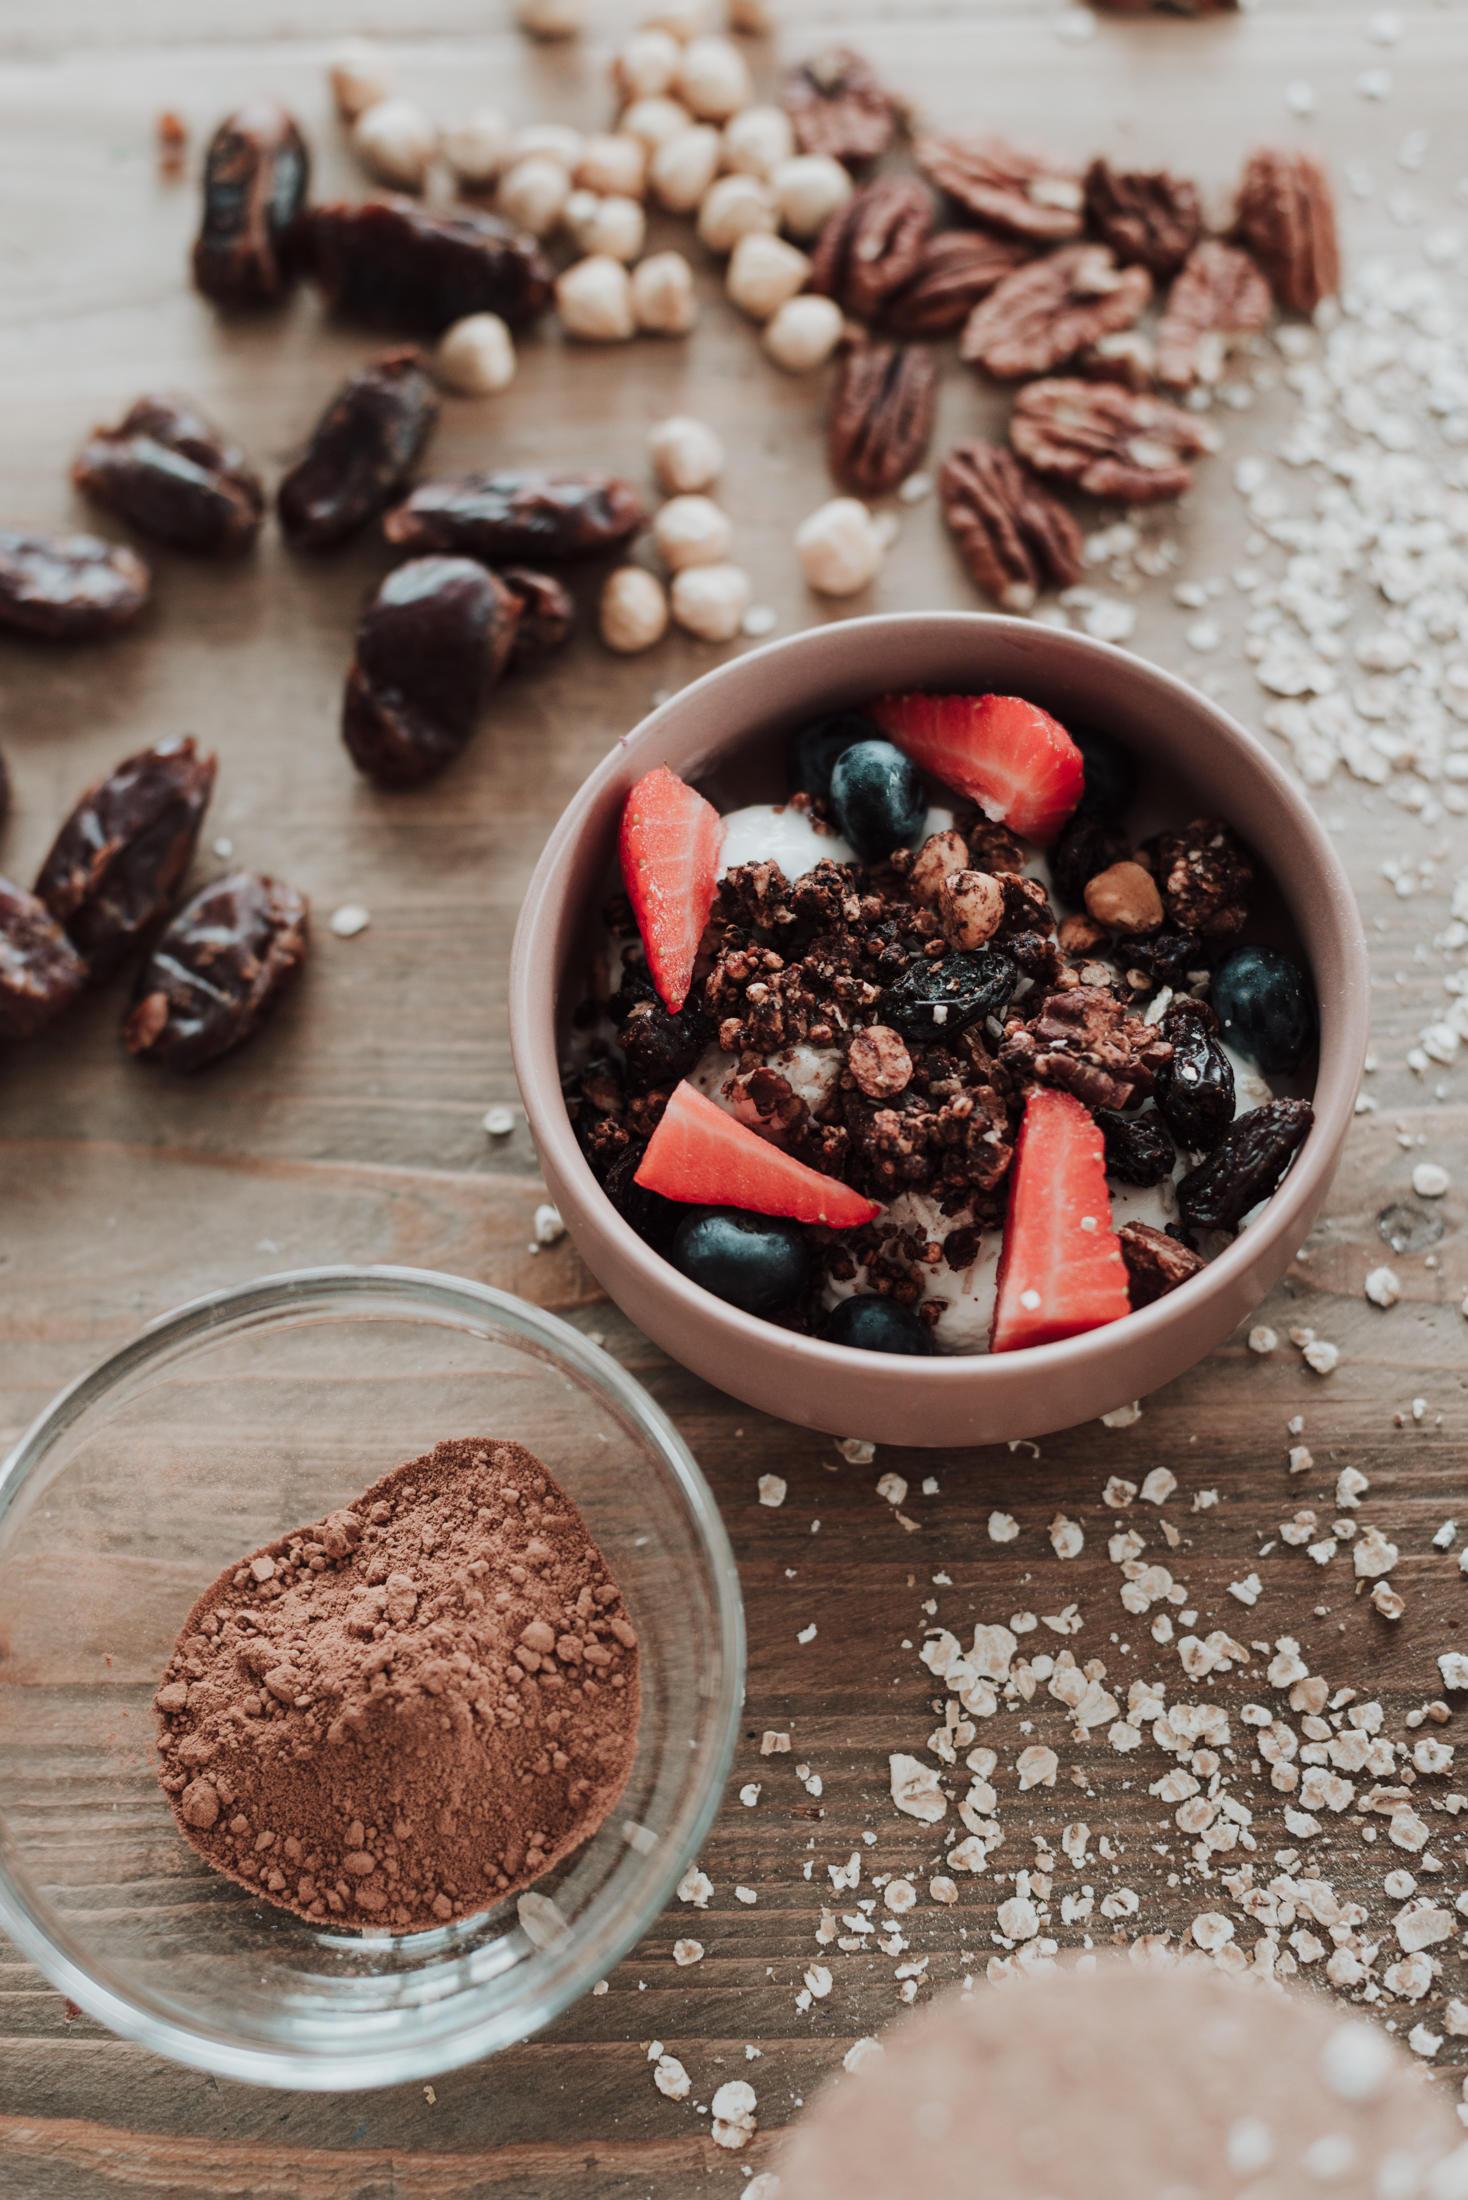 choc quinoa granola leanmeanmomma healthy breakfasts